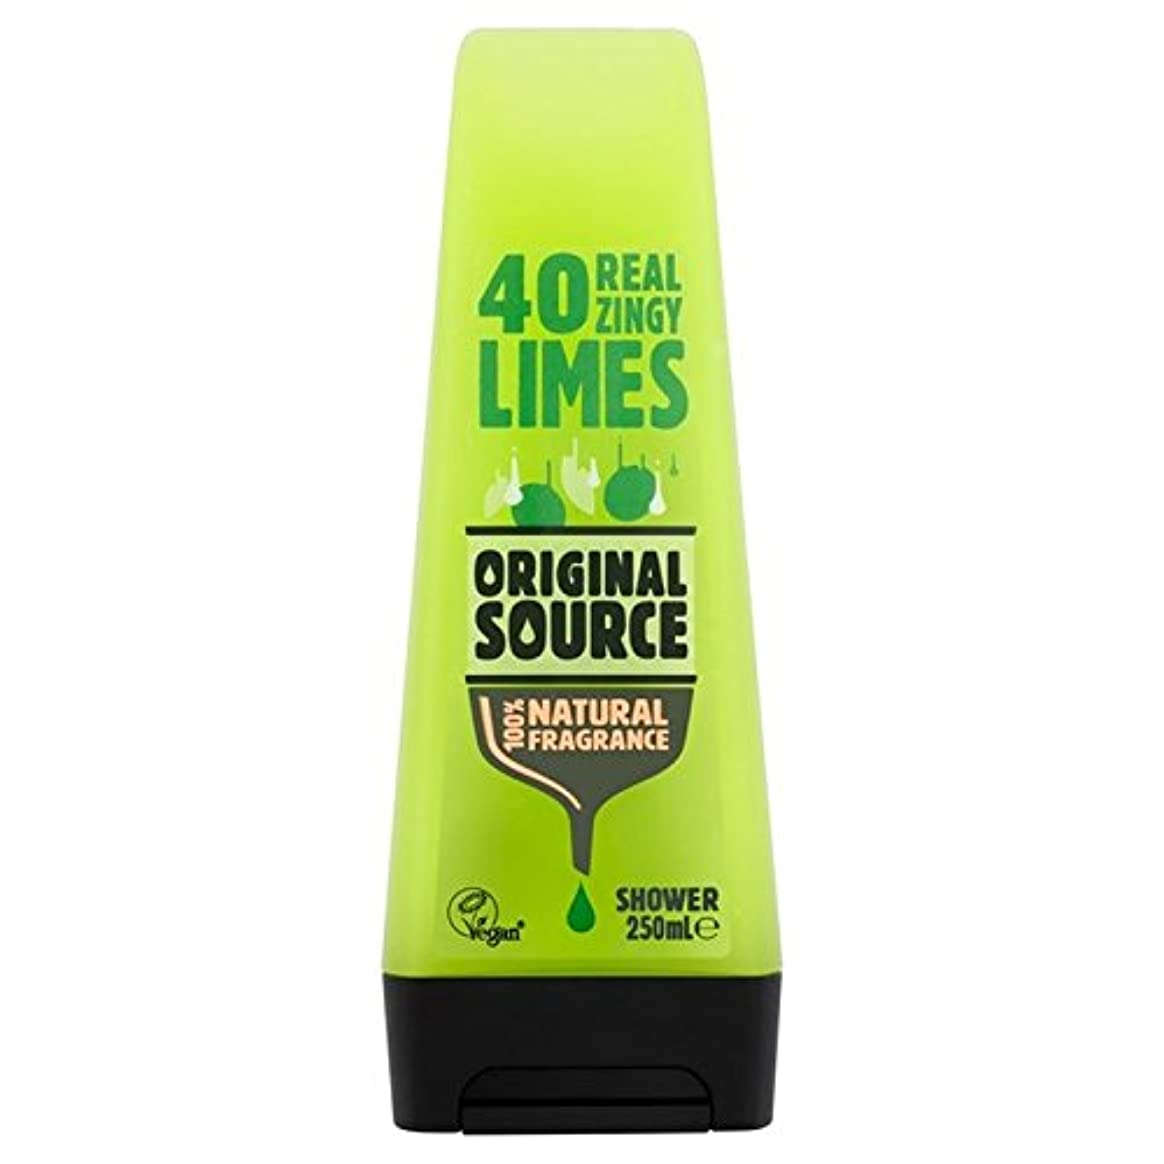 Original Source Lime Shower Gel 250ml (Pack of 6) - 元のソースライムシャワージェル250ミリリットル x6 [並行輸入品]